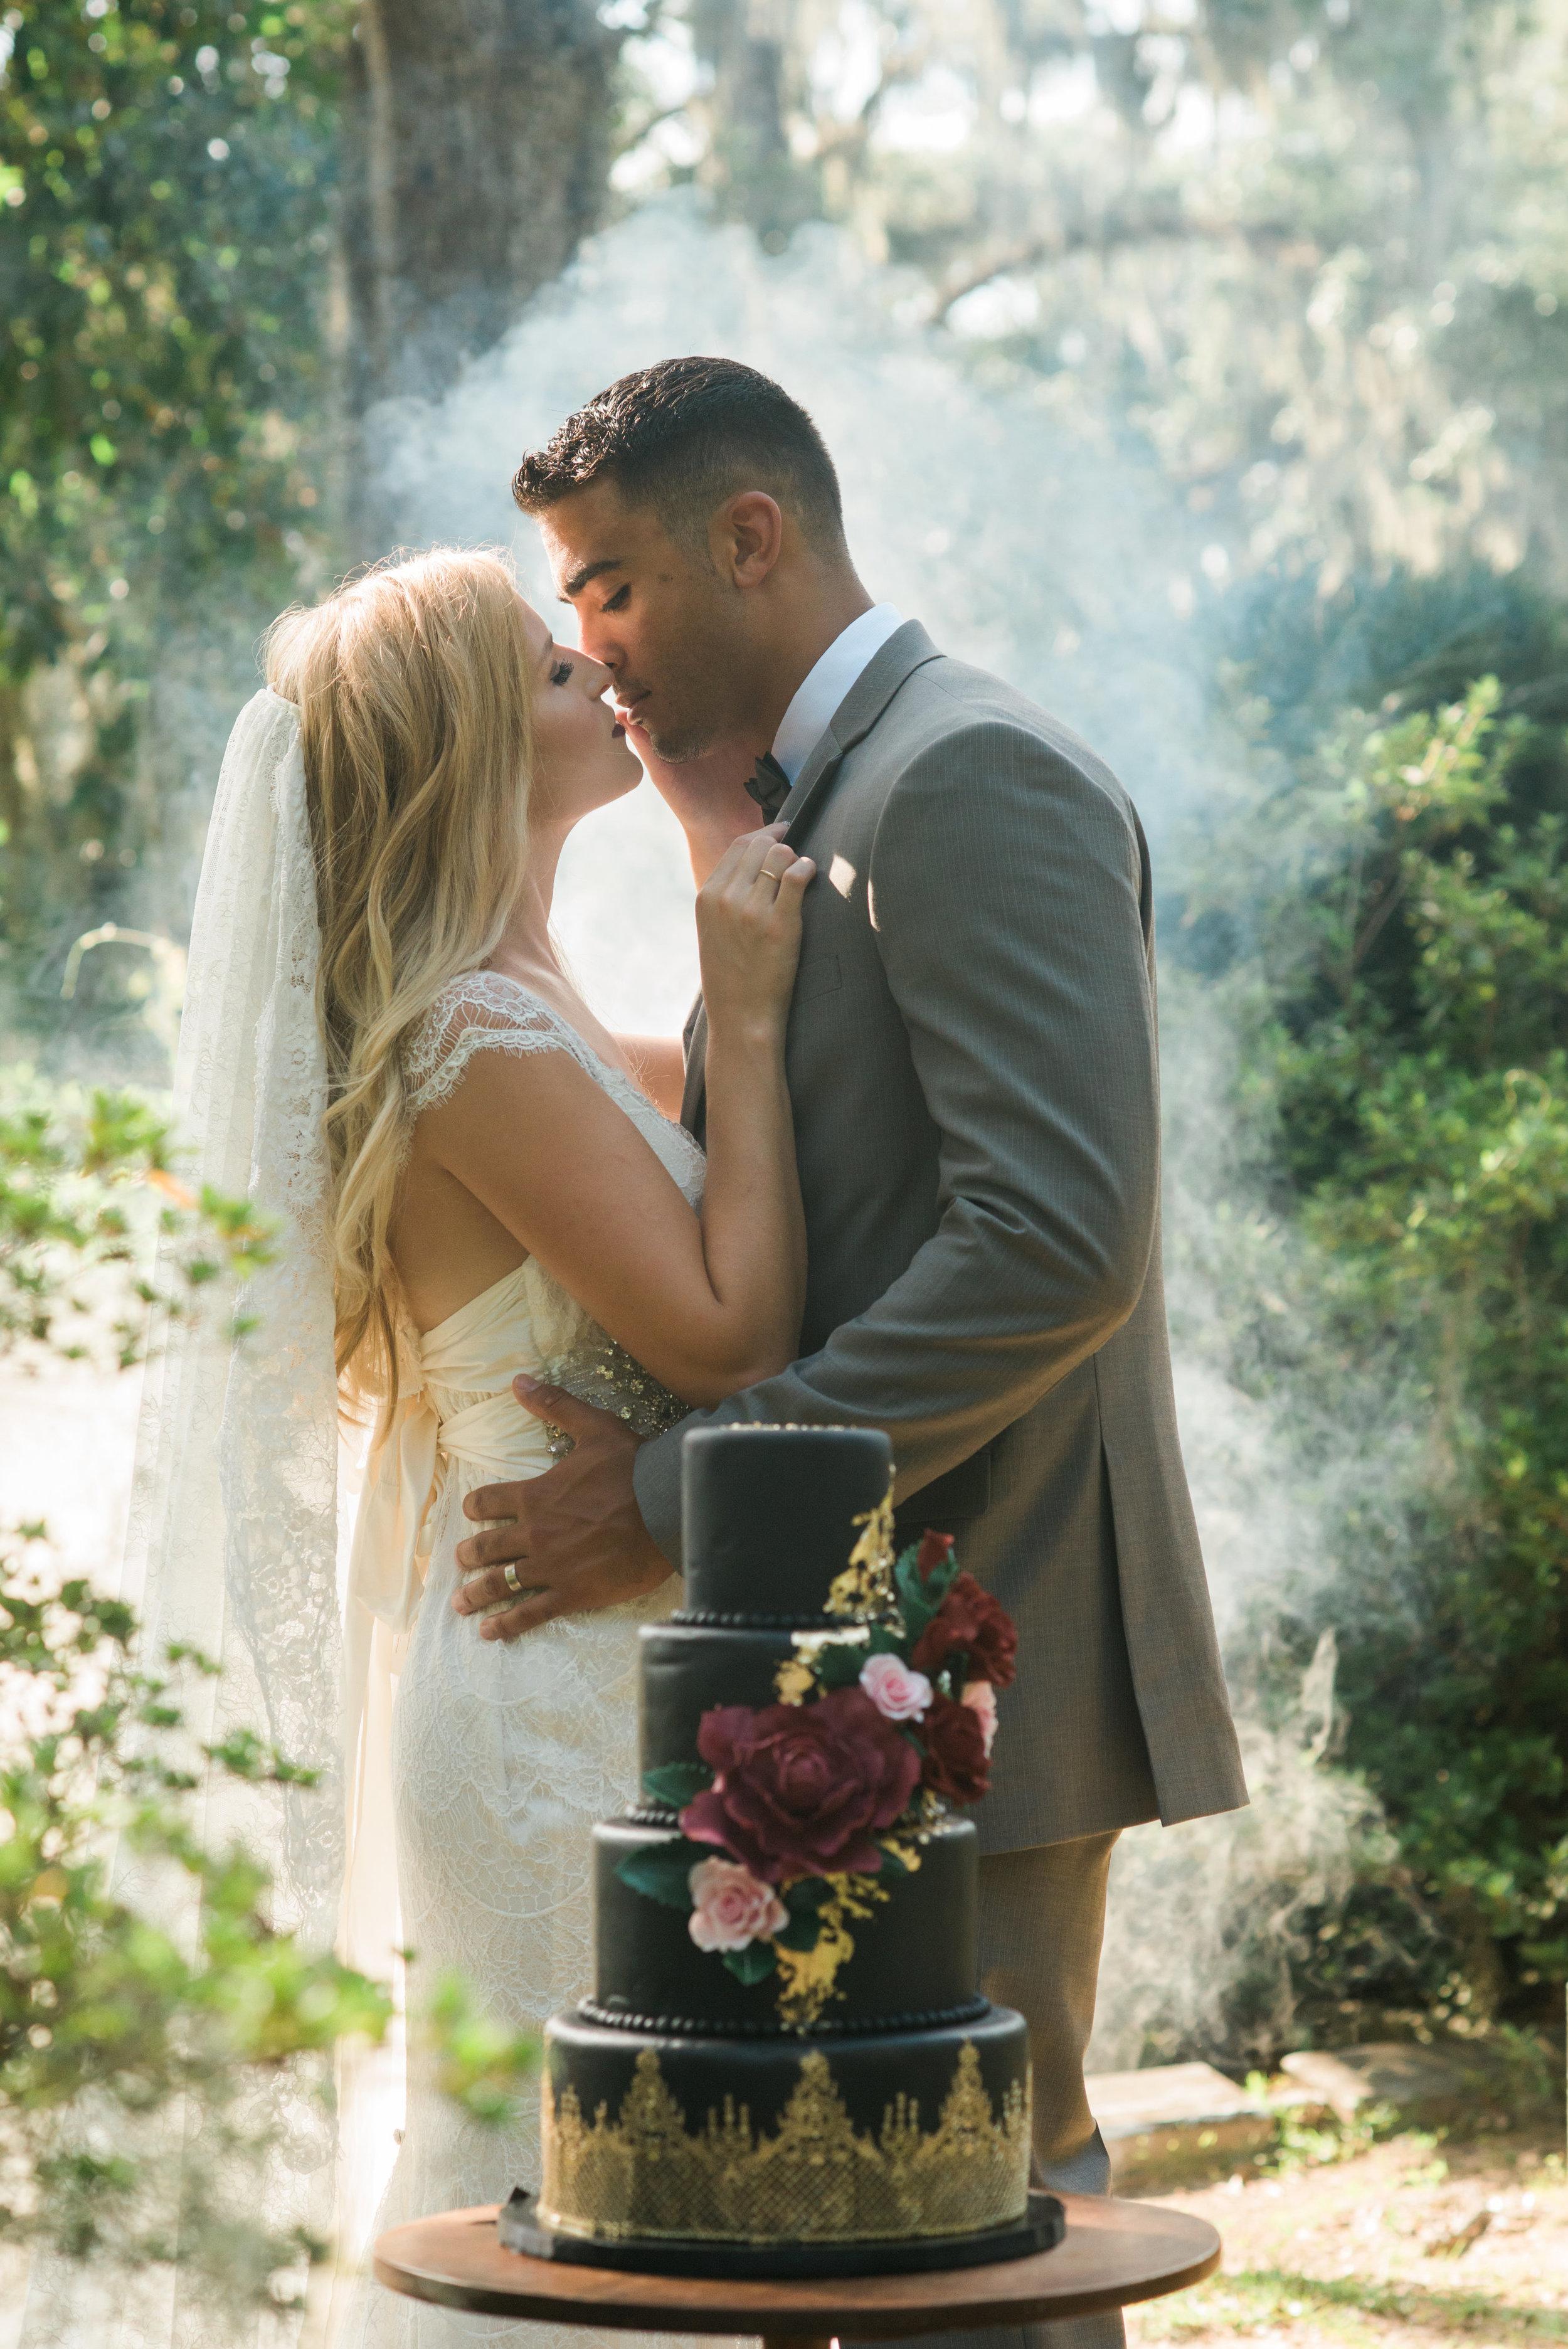 callie-beale-photography-Bonaventure-cemetery-michelle-royal-makeup-cemetery-wedding-ivory-and-beau-wedding-planning-anna-campbell-harper-savannah-bridal-boutique-savannah-wedding-dresses-savannah-weddings-14.jpg